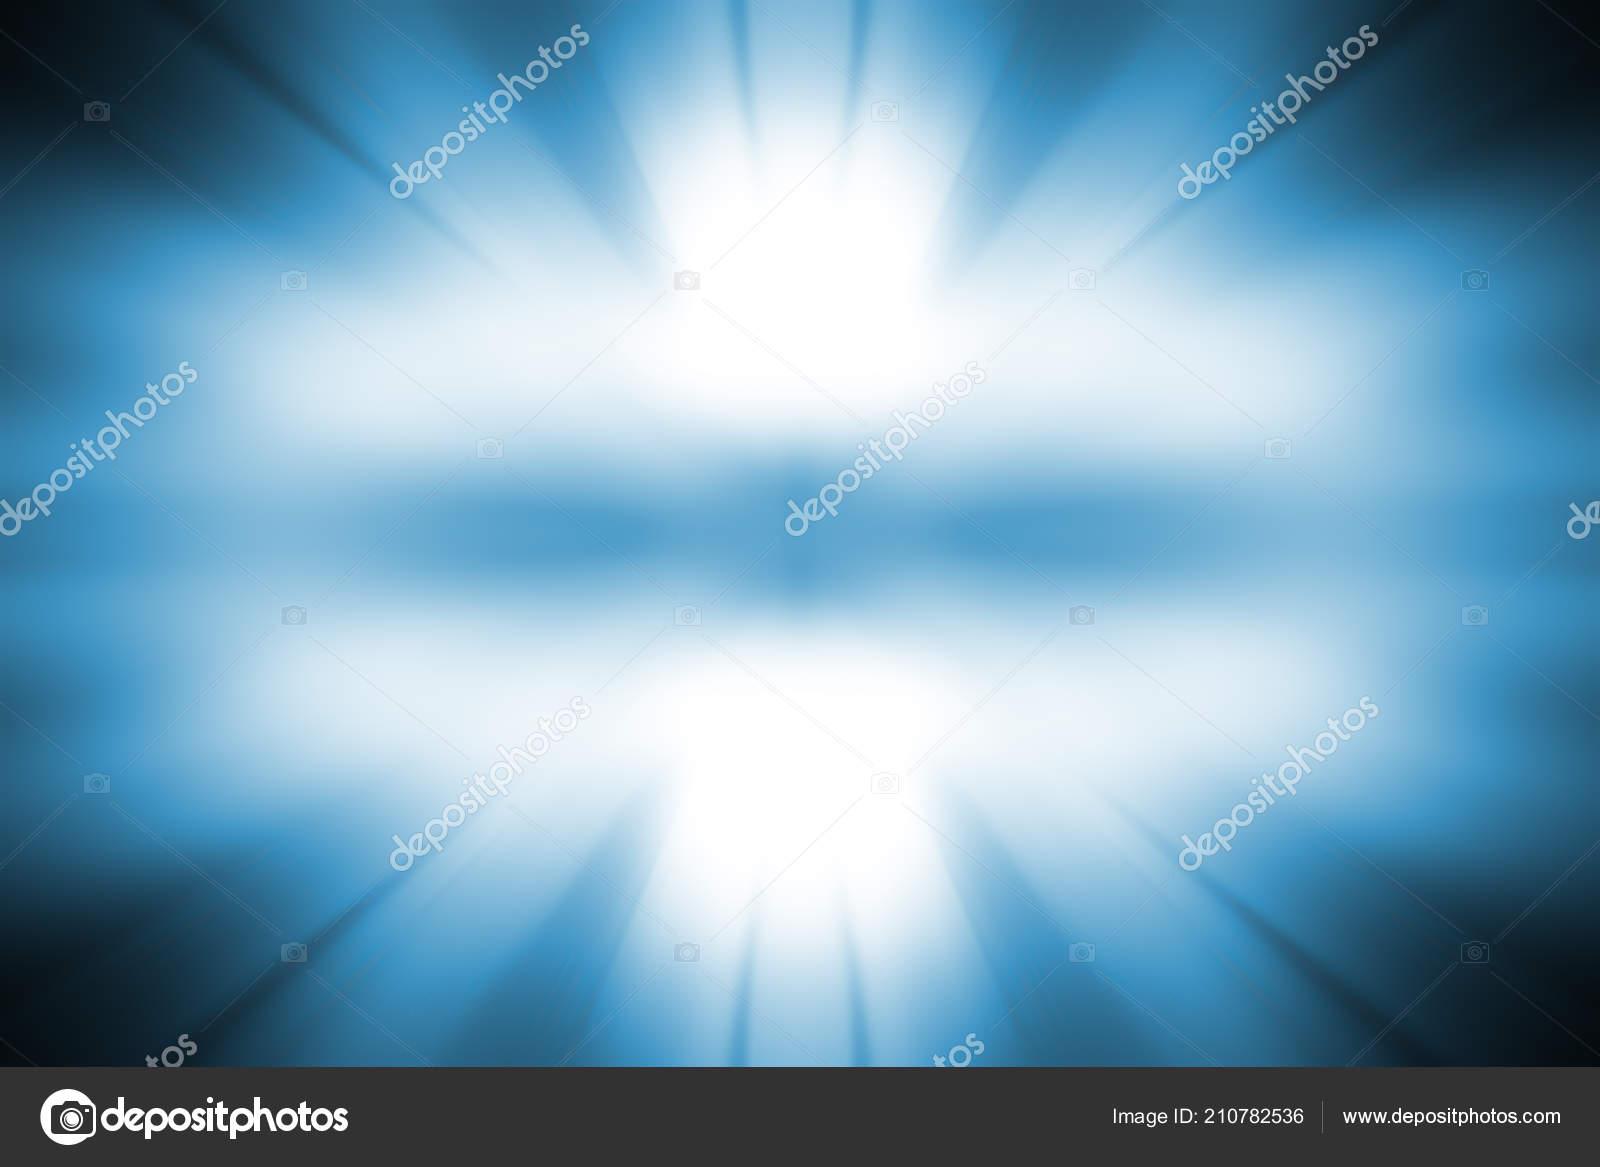 fond degrade bleu clair fond ecran bleu effet degrade radial image libre de droit par ooddysmile c 210782536